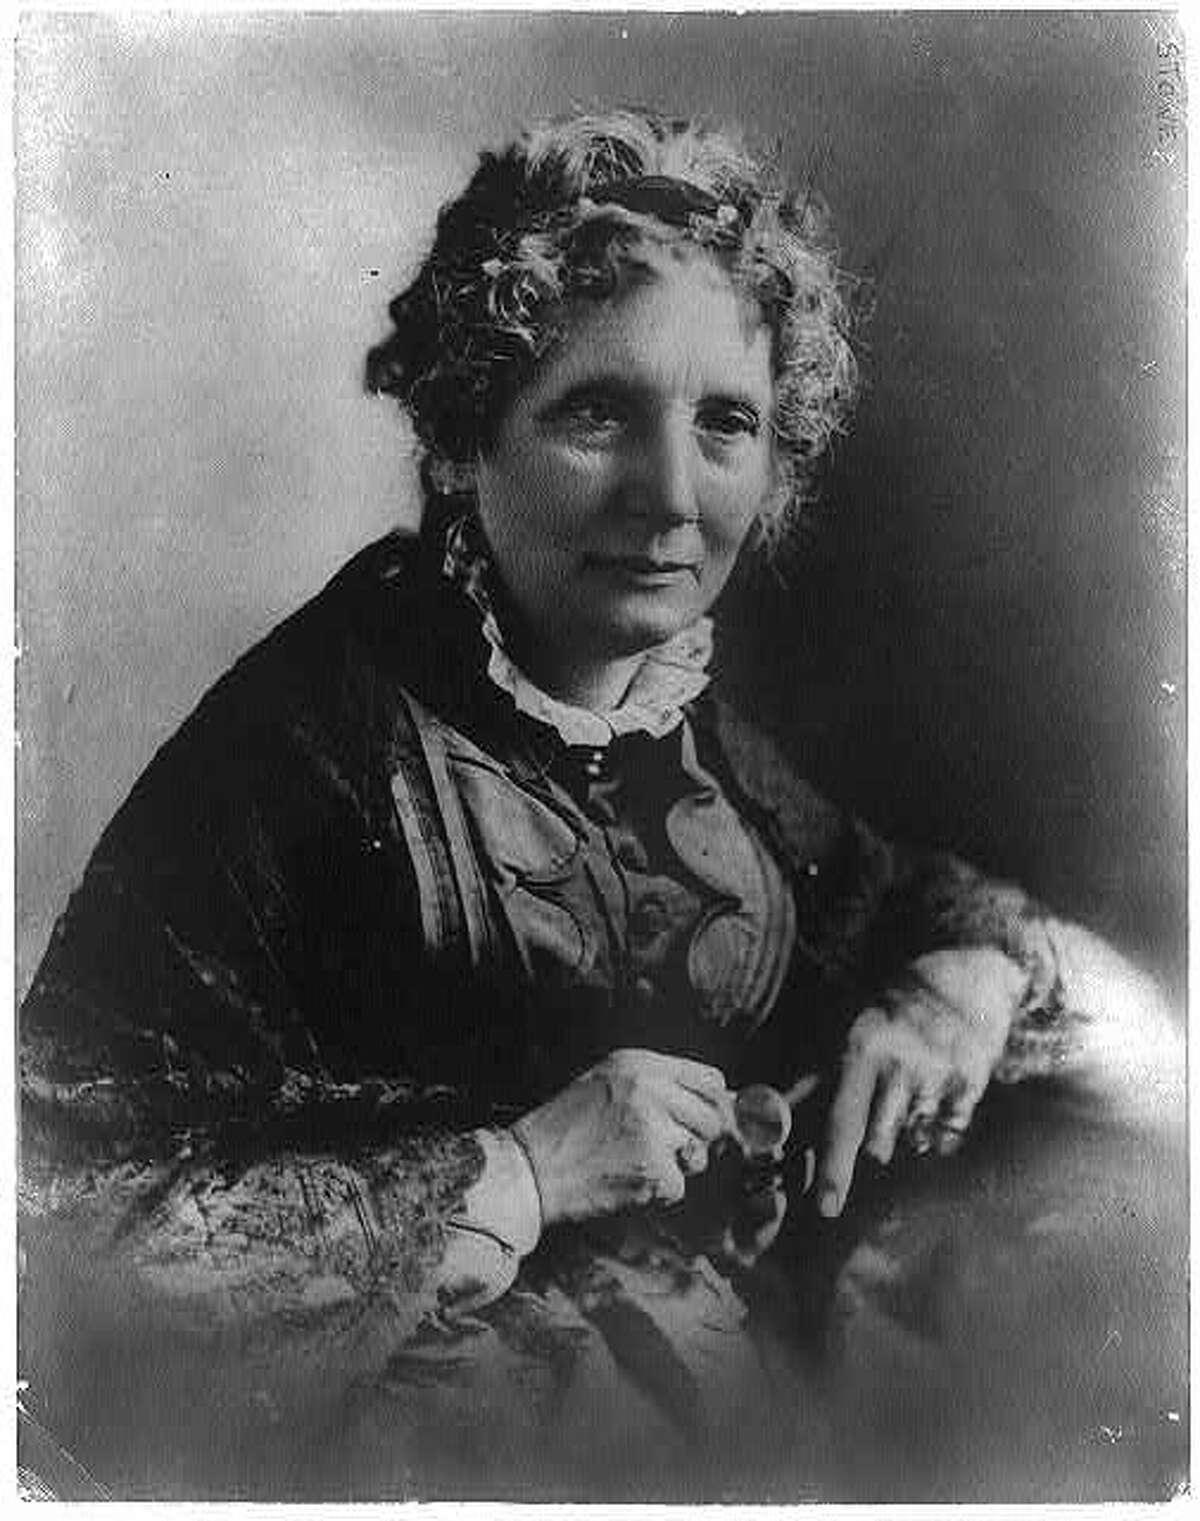 Harriet Beecher Stowe (1811-1896), author of the classic anti-slavery novel,